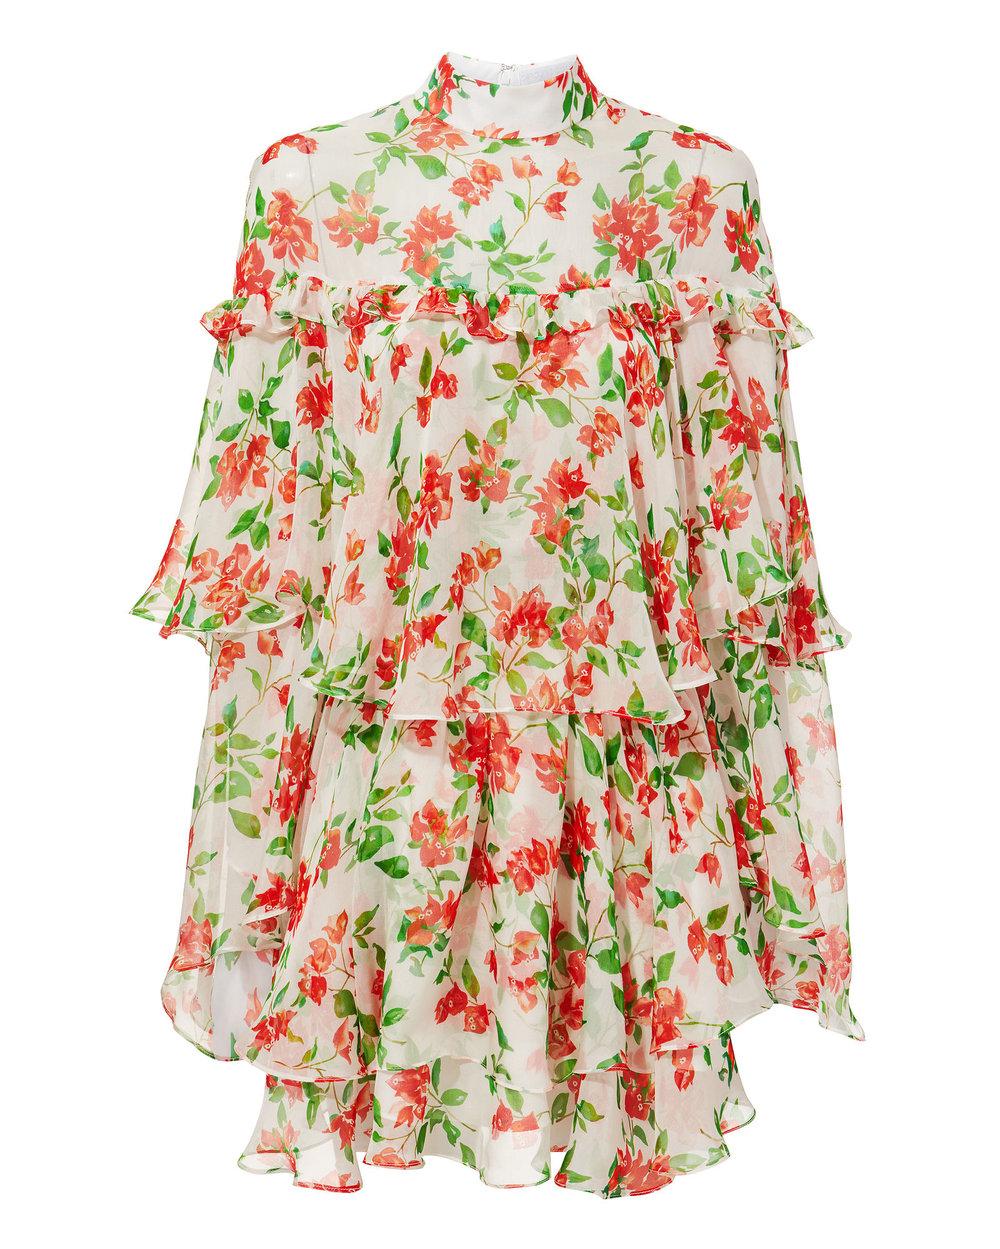 CAROLINE CONSTAS Tessa Floral Mini Dress